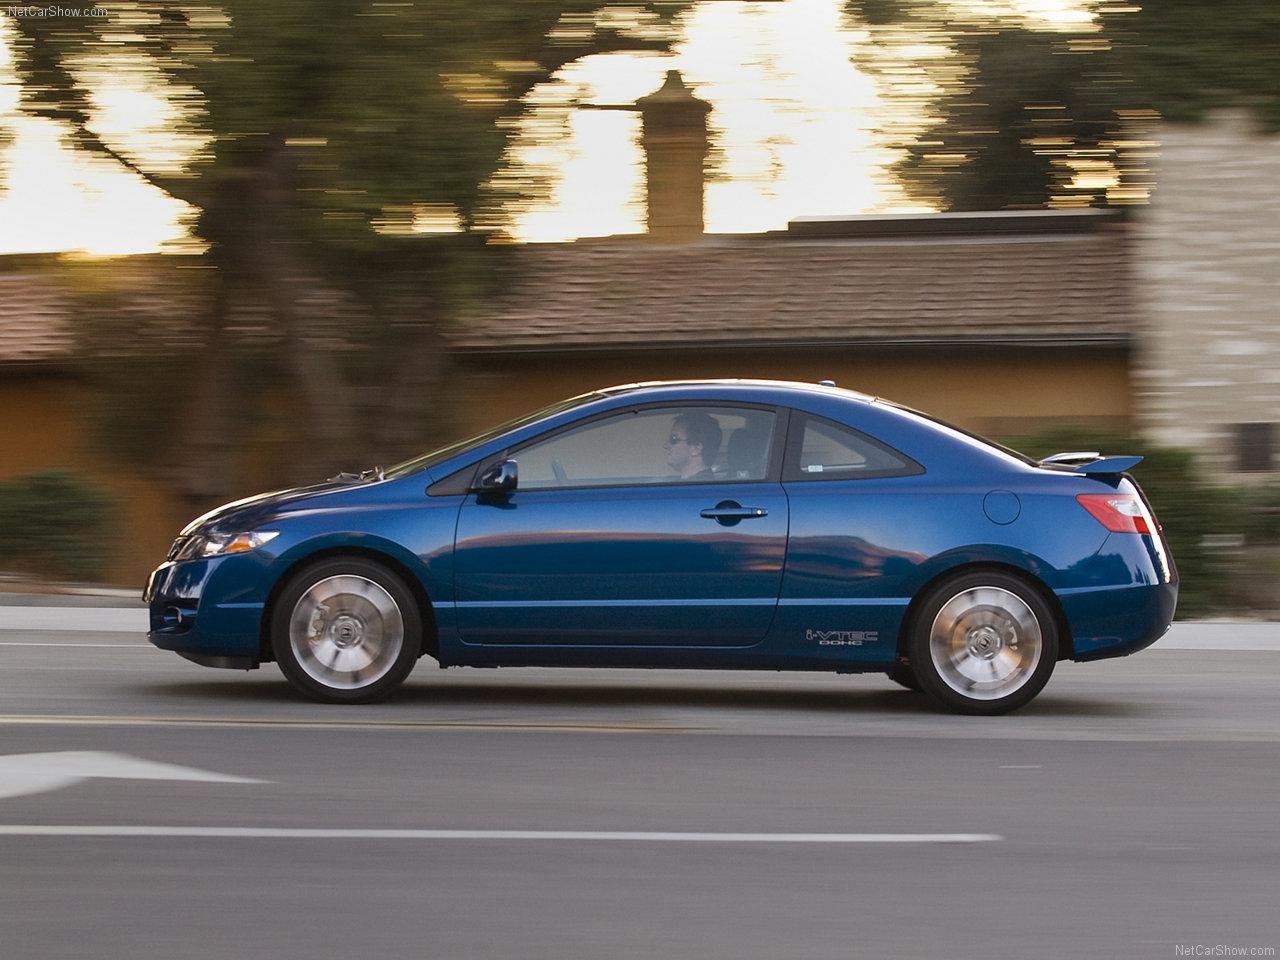 http://3.bp.blogspot.com/-YmM2igSsg_k/TYoLI8RXYqI/AAAAAAAADCI/yVKj5JjhR74/s1600/Honda-Civic_Si_Coupe_2009_1280x960_wallpaper_04.jpg